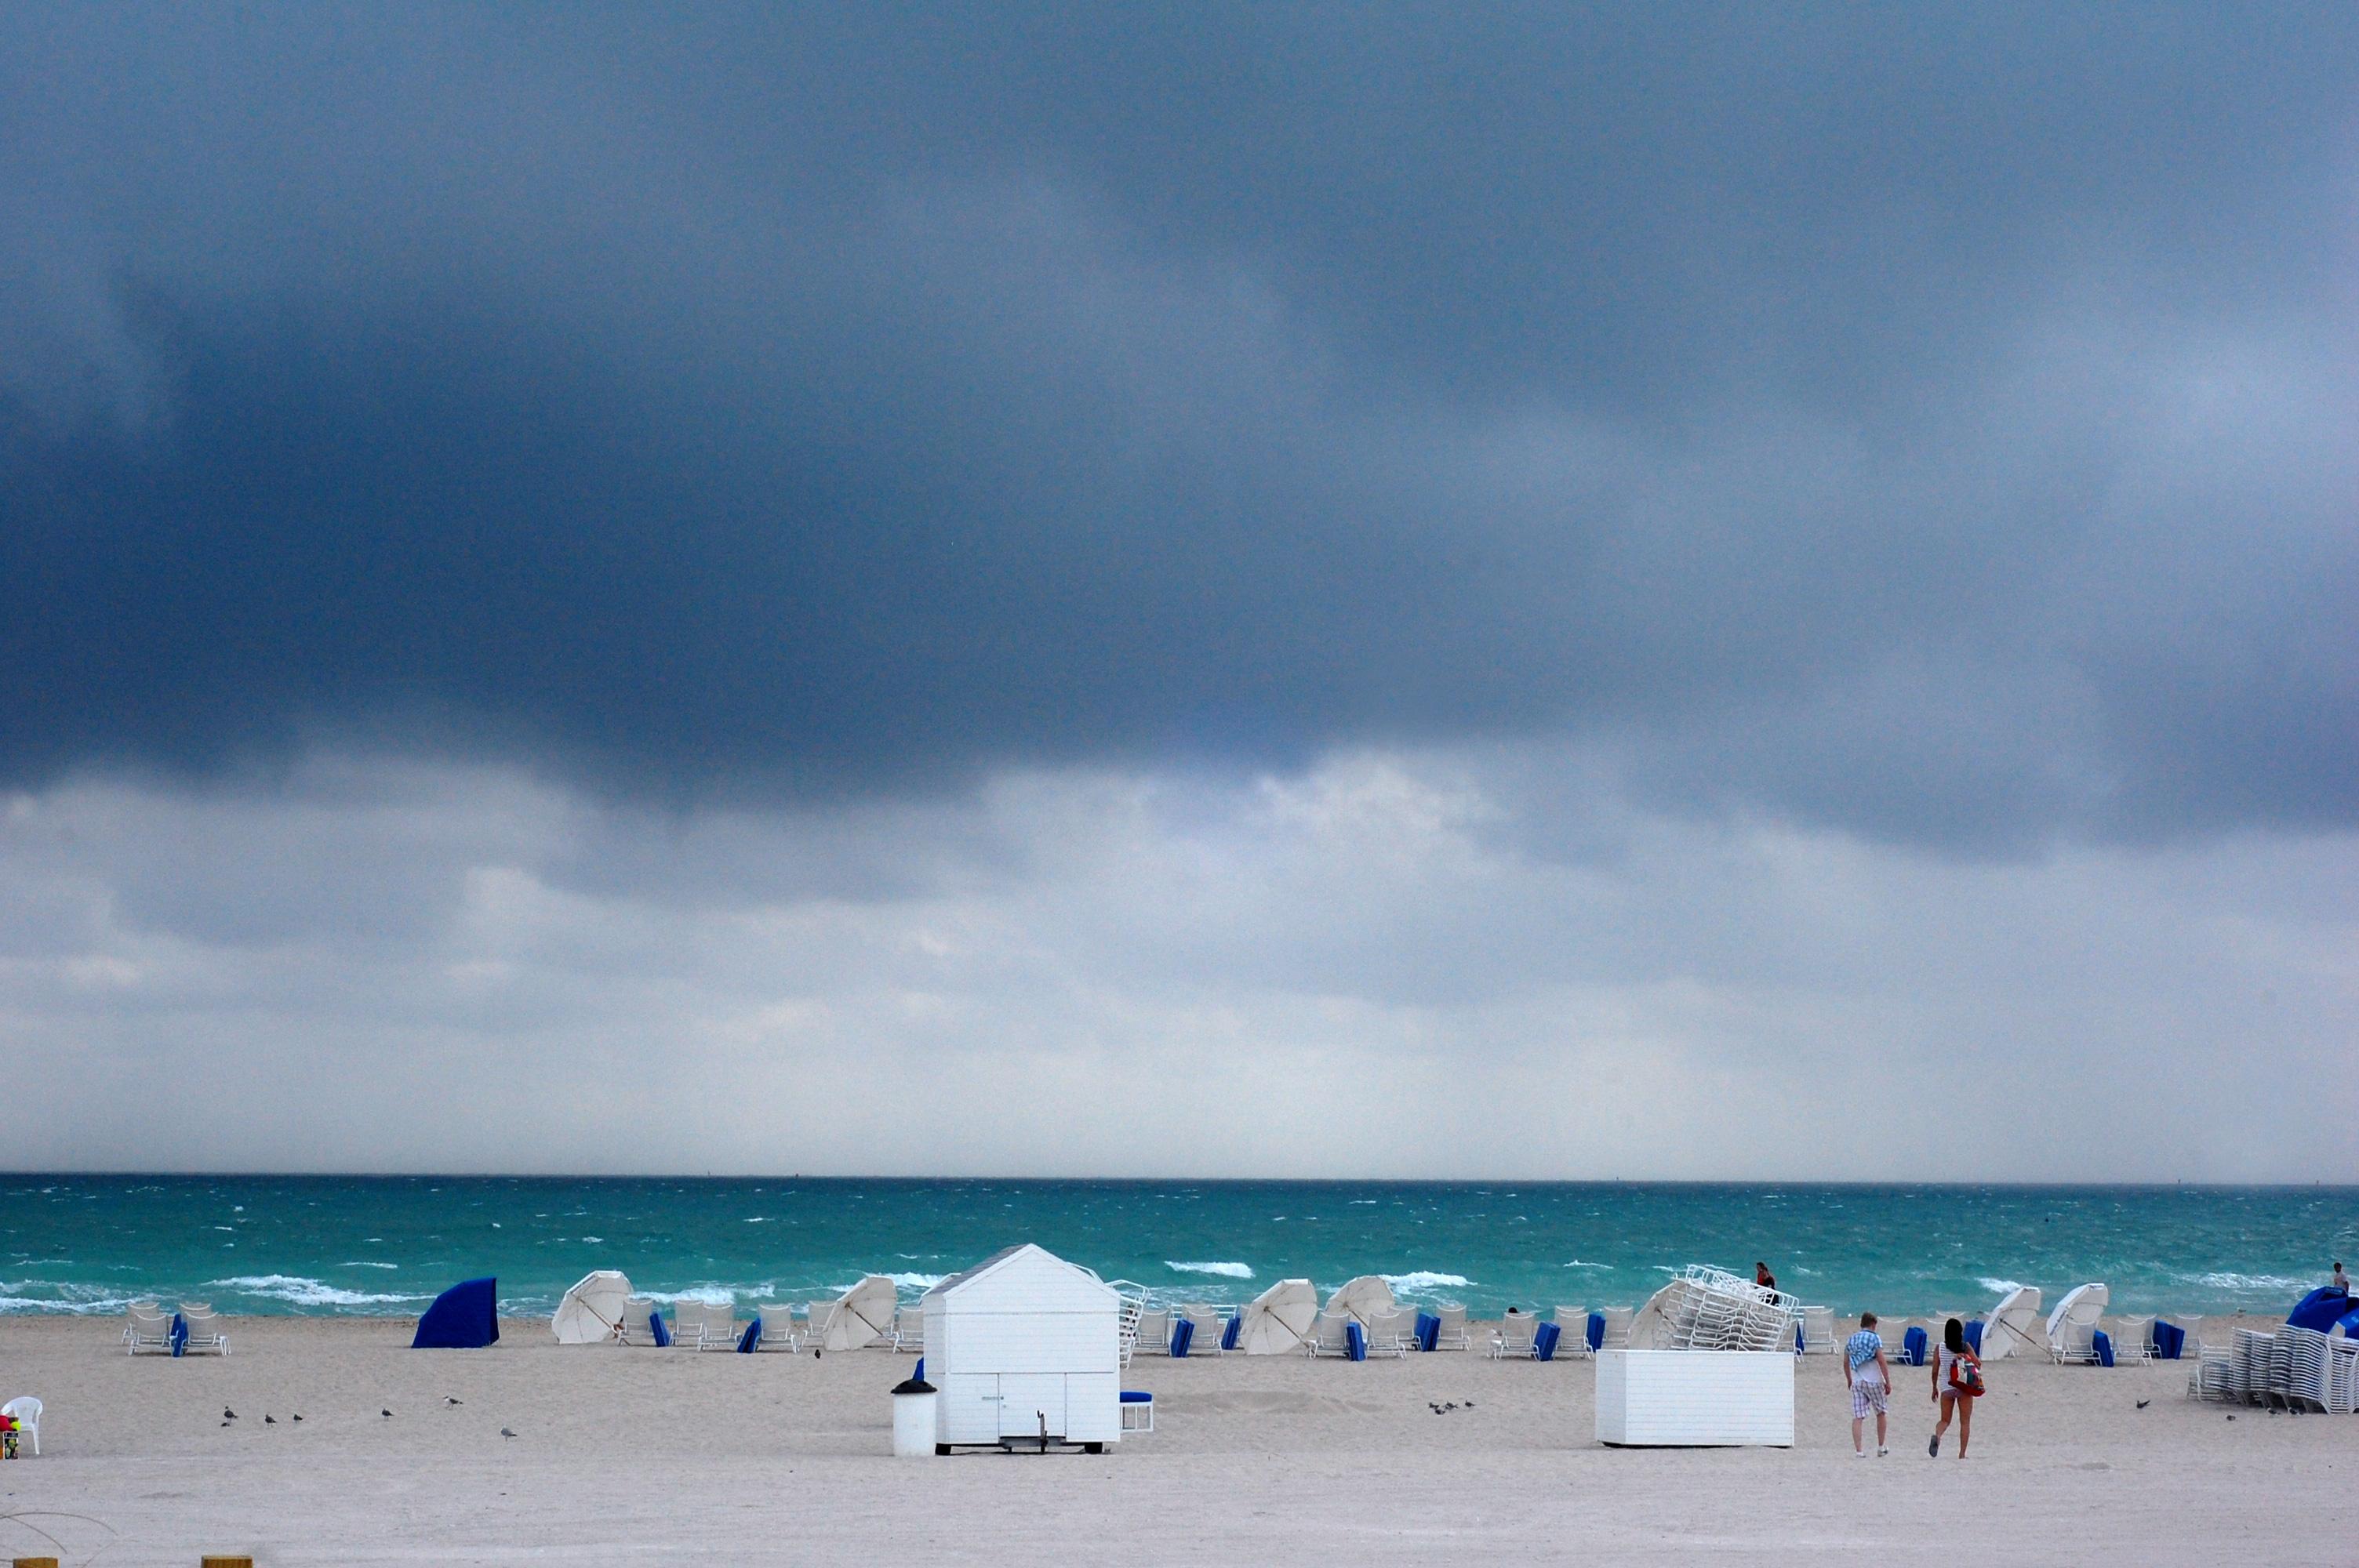 Ominous Clouds